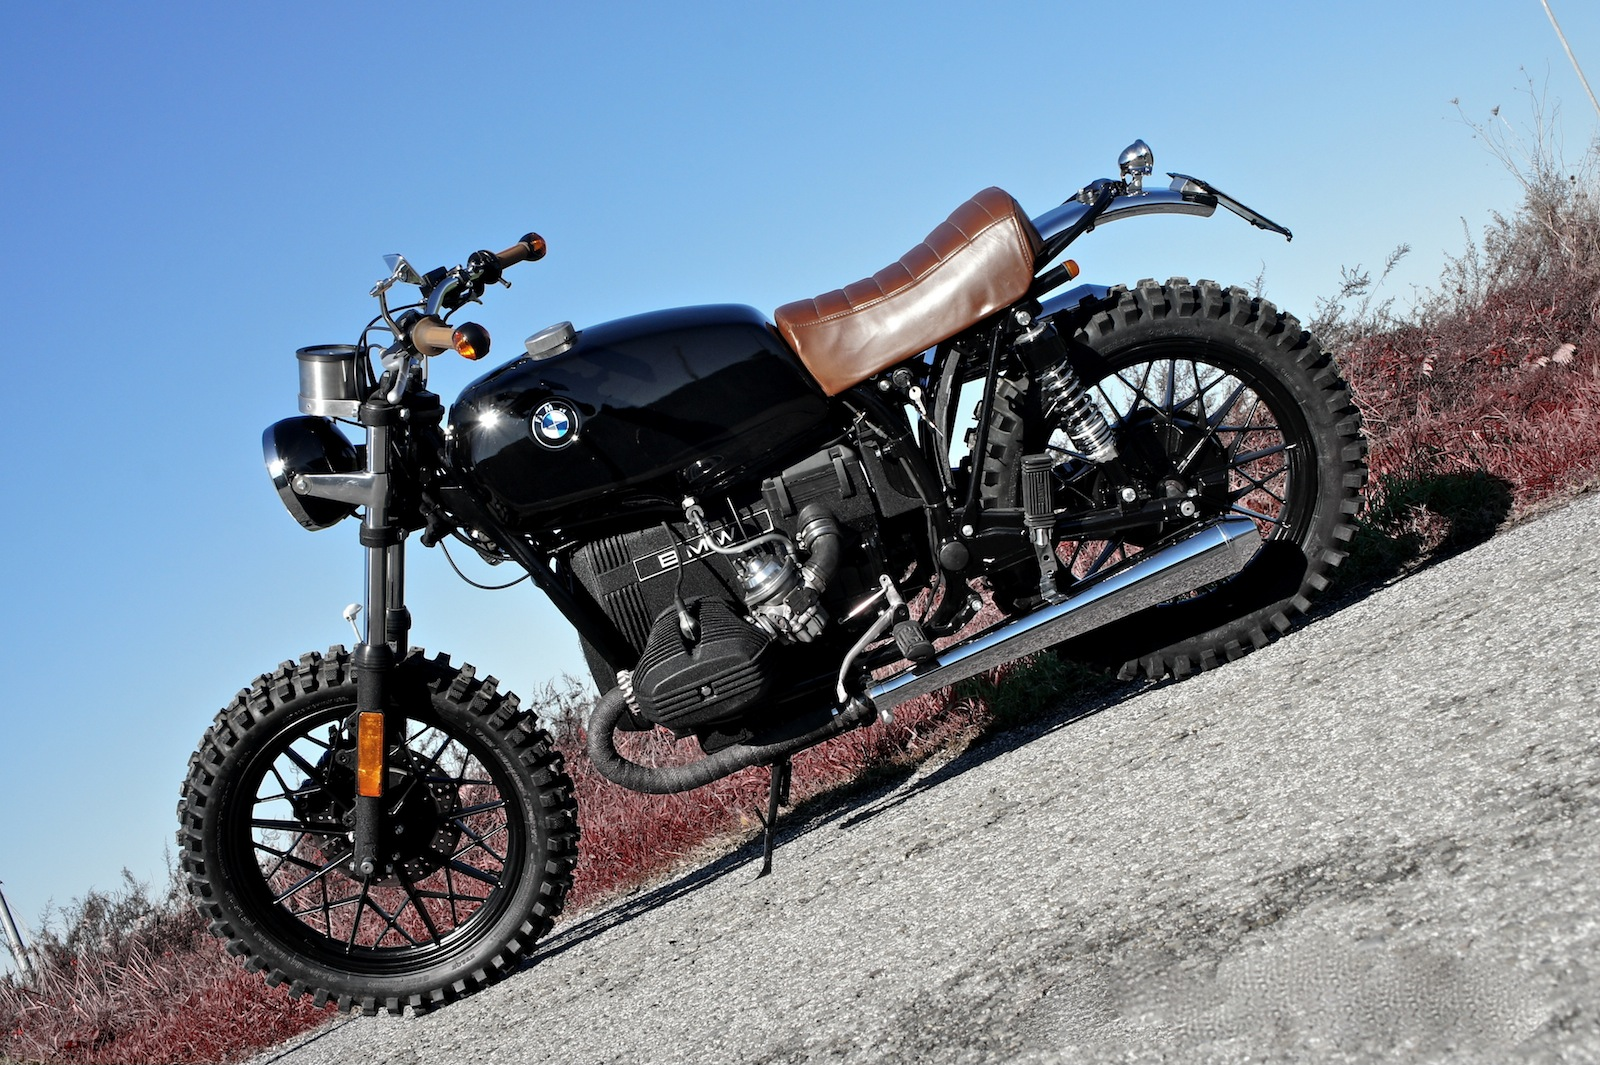 r45 scram by luis moto inazuma caf racer. Black Bedroom Furniture Sets. Home Design Ideas